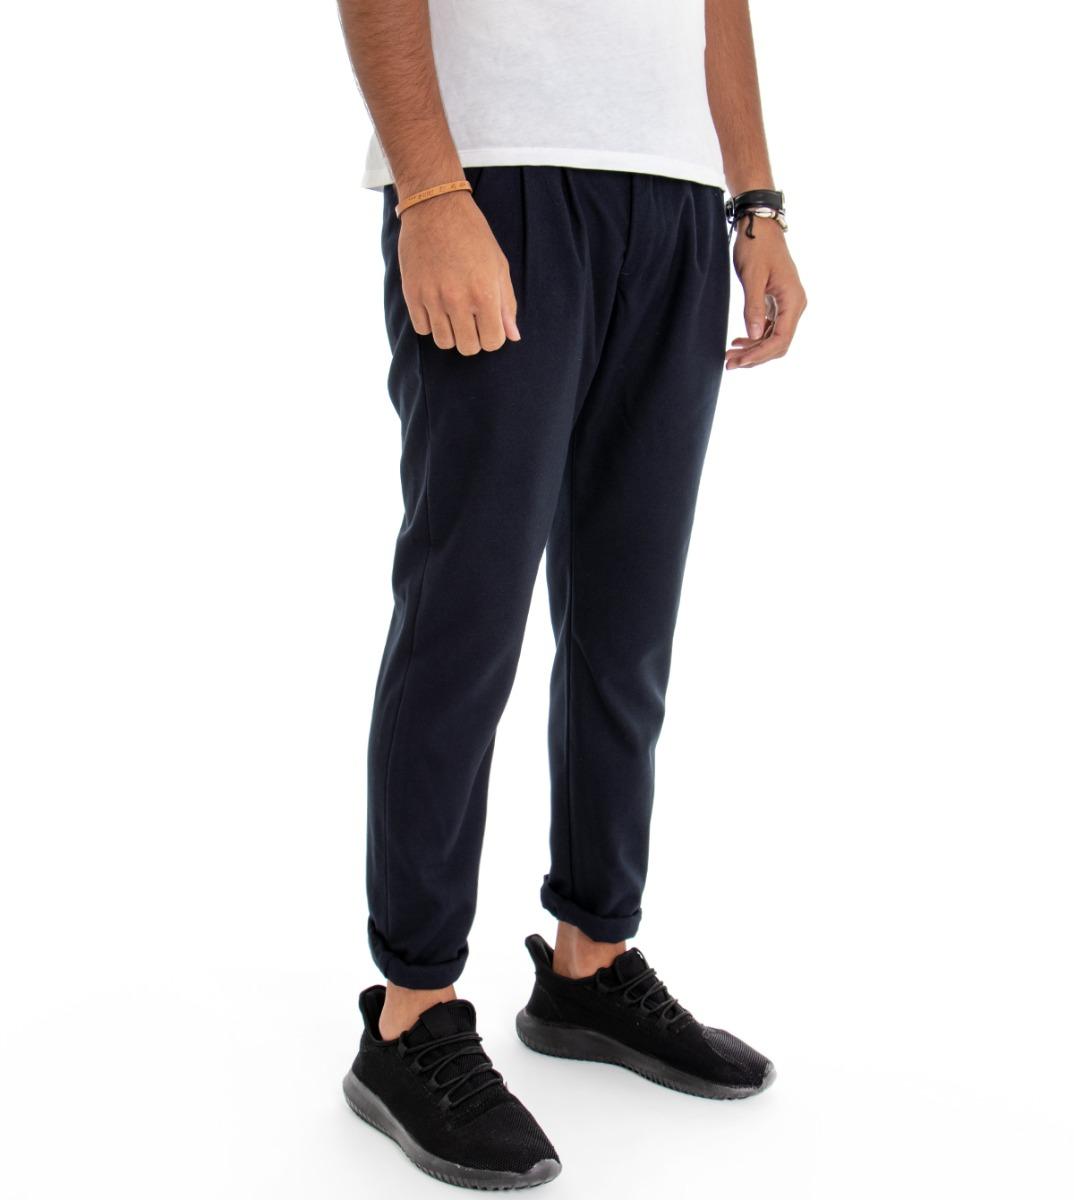 Pantalone-Uomo-con-Pence-Tasca-America-Blu-Tinta-Unita-Cavallo-Basso-Regular miniatura 2